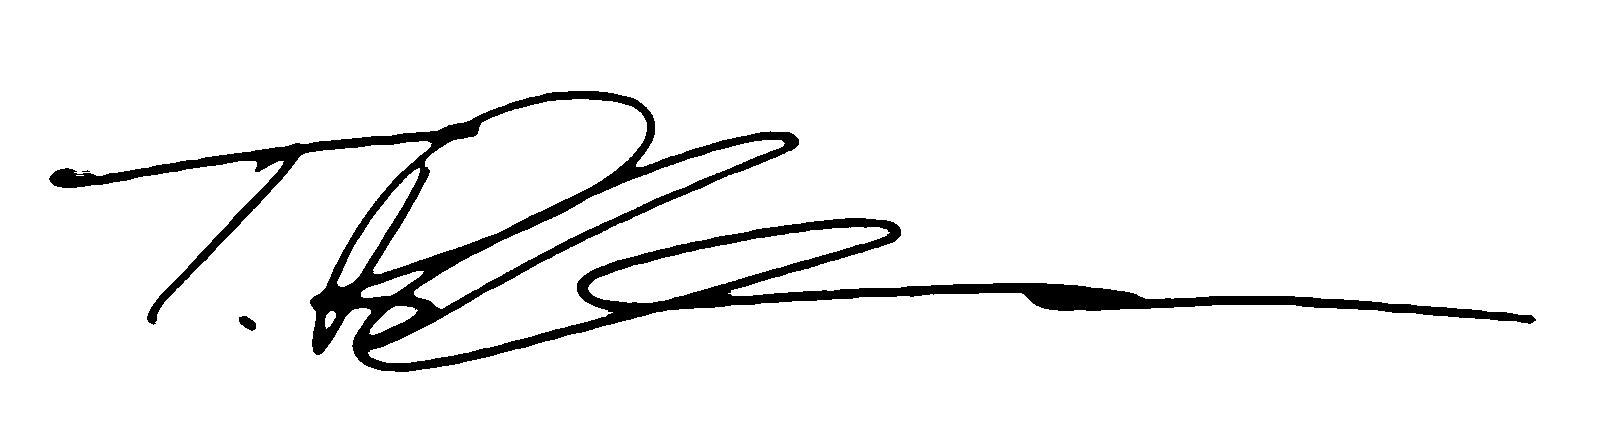 robertdtone's Signature